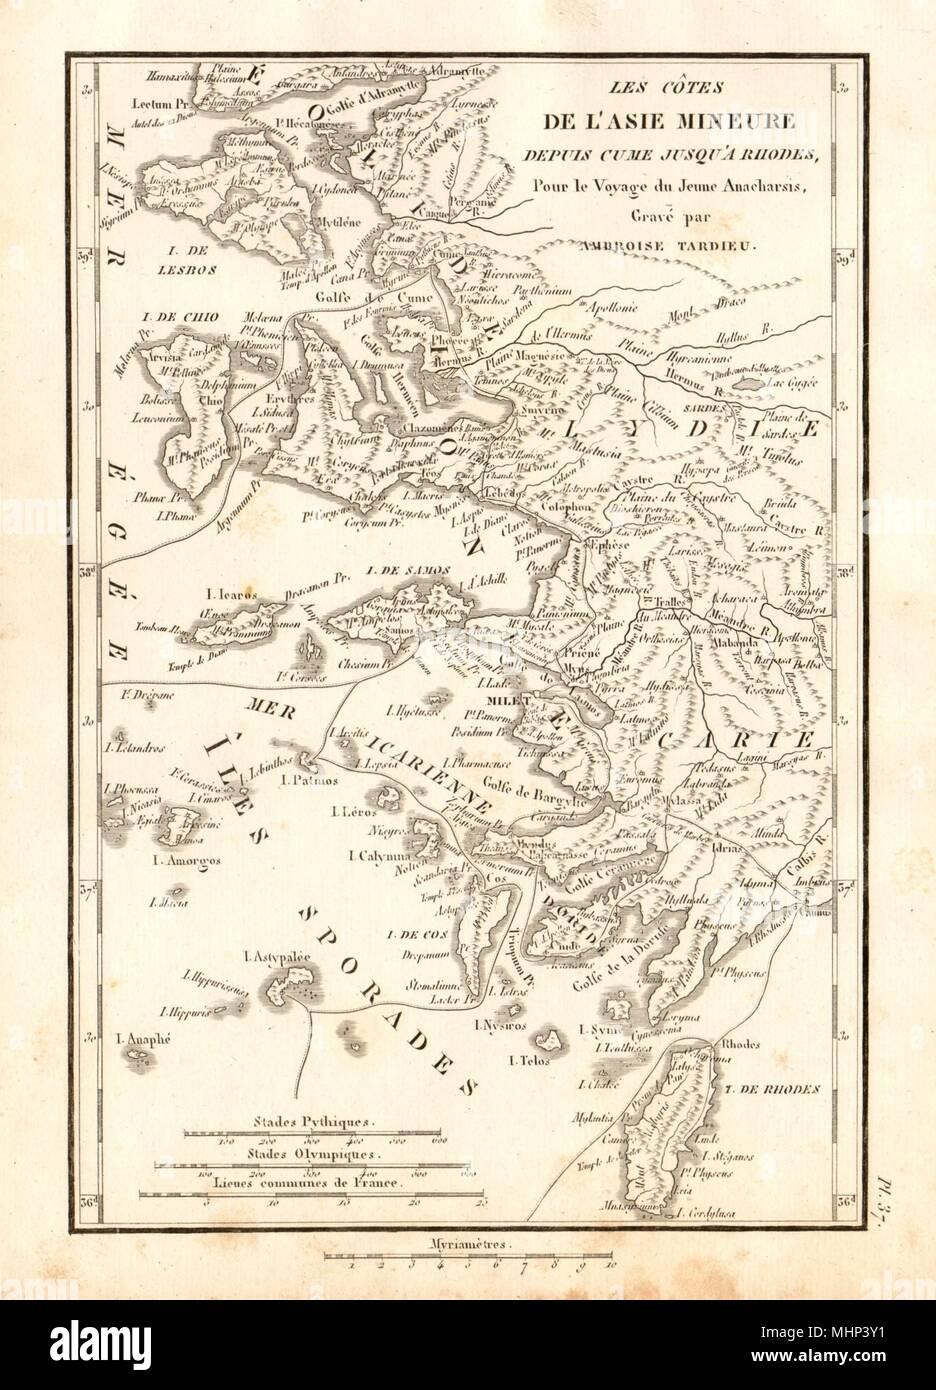 Türkische ägäis Karte.Dodekanes Inseln Der ägäis Les Cotes De L Asie Mineure Türkische